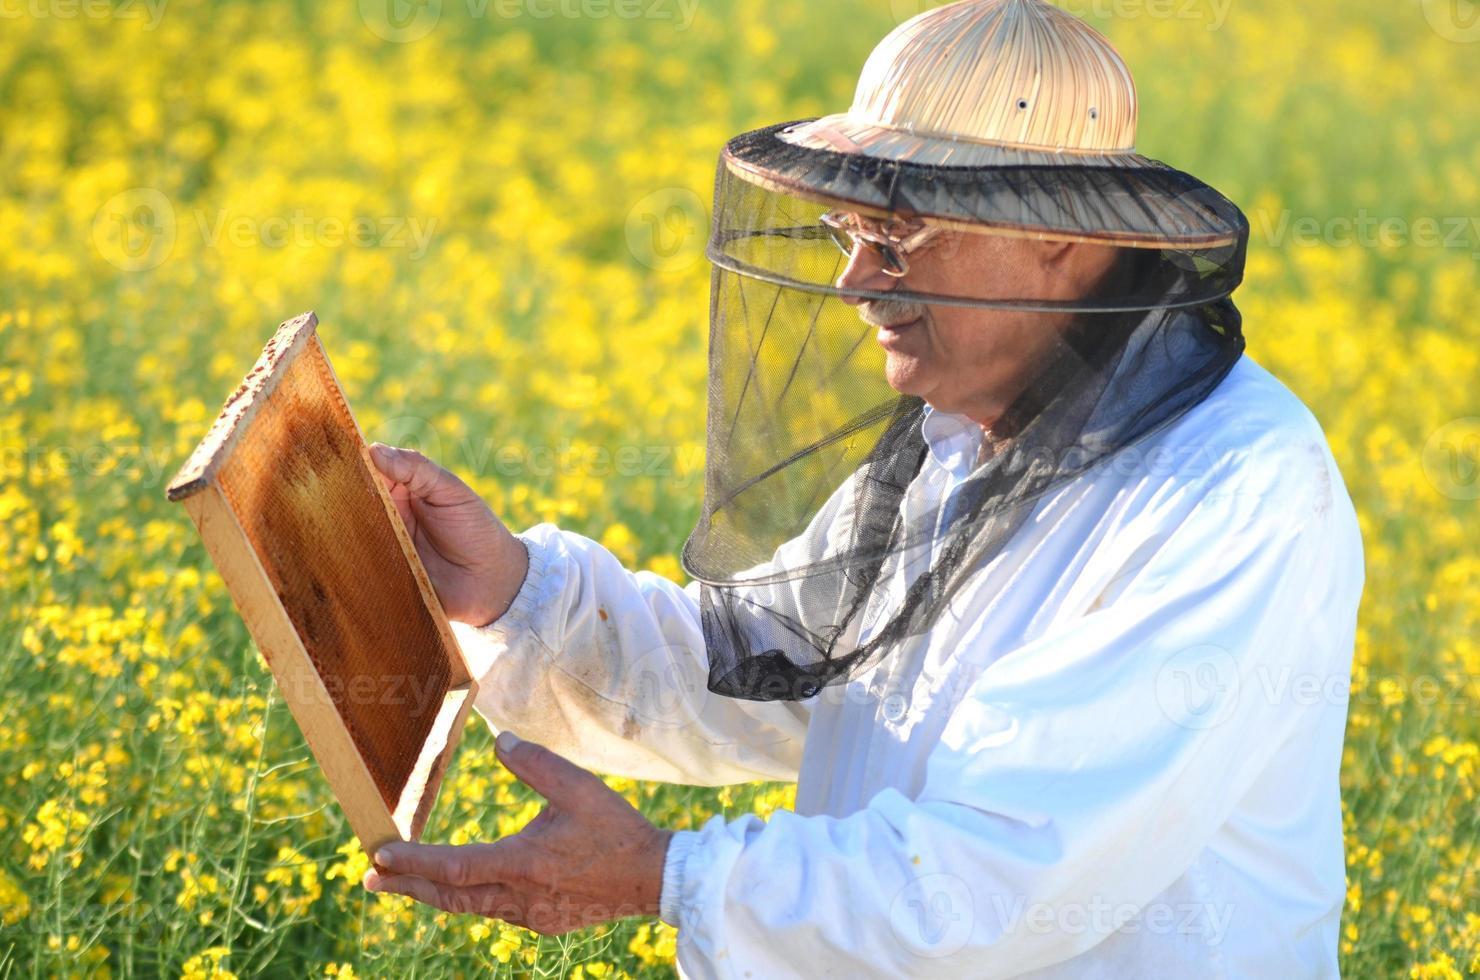 erfaren senior apiarist som arbetar i det blommande rapsfältet foto